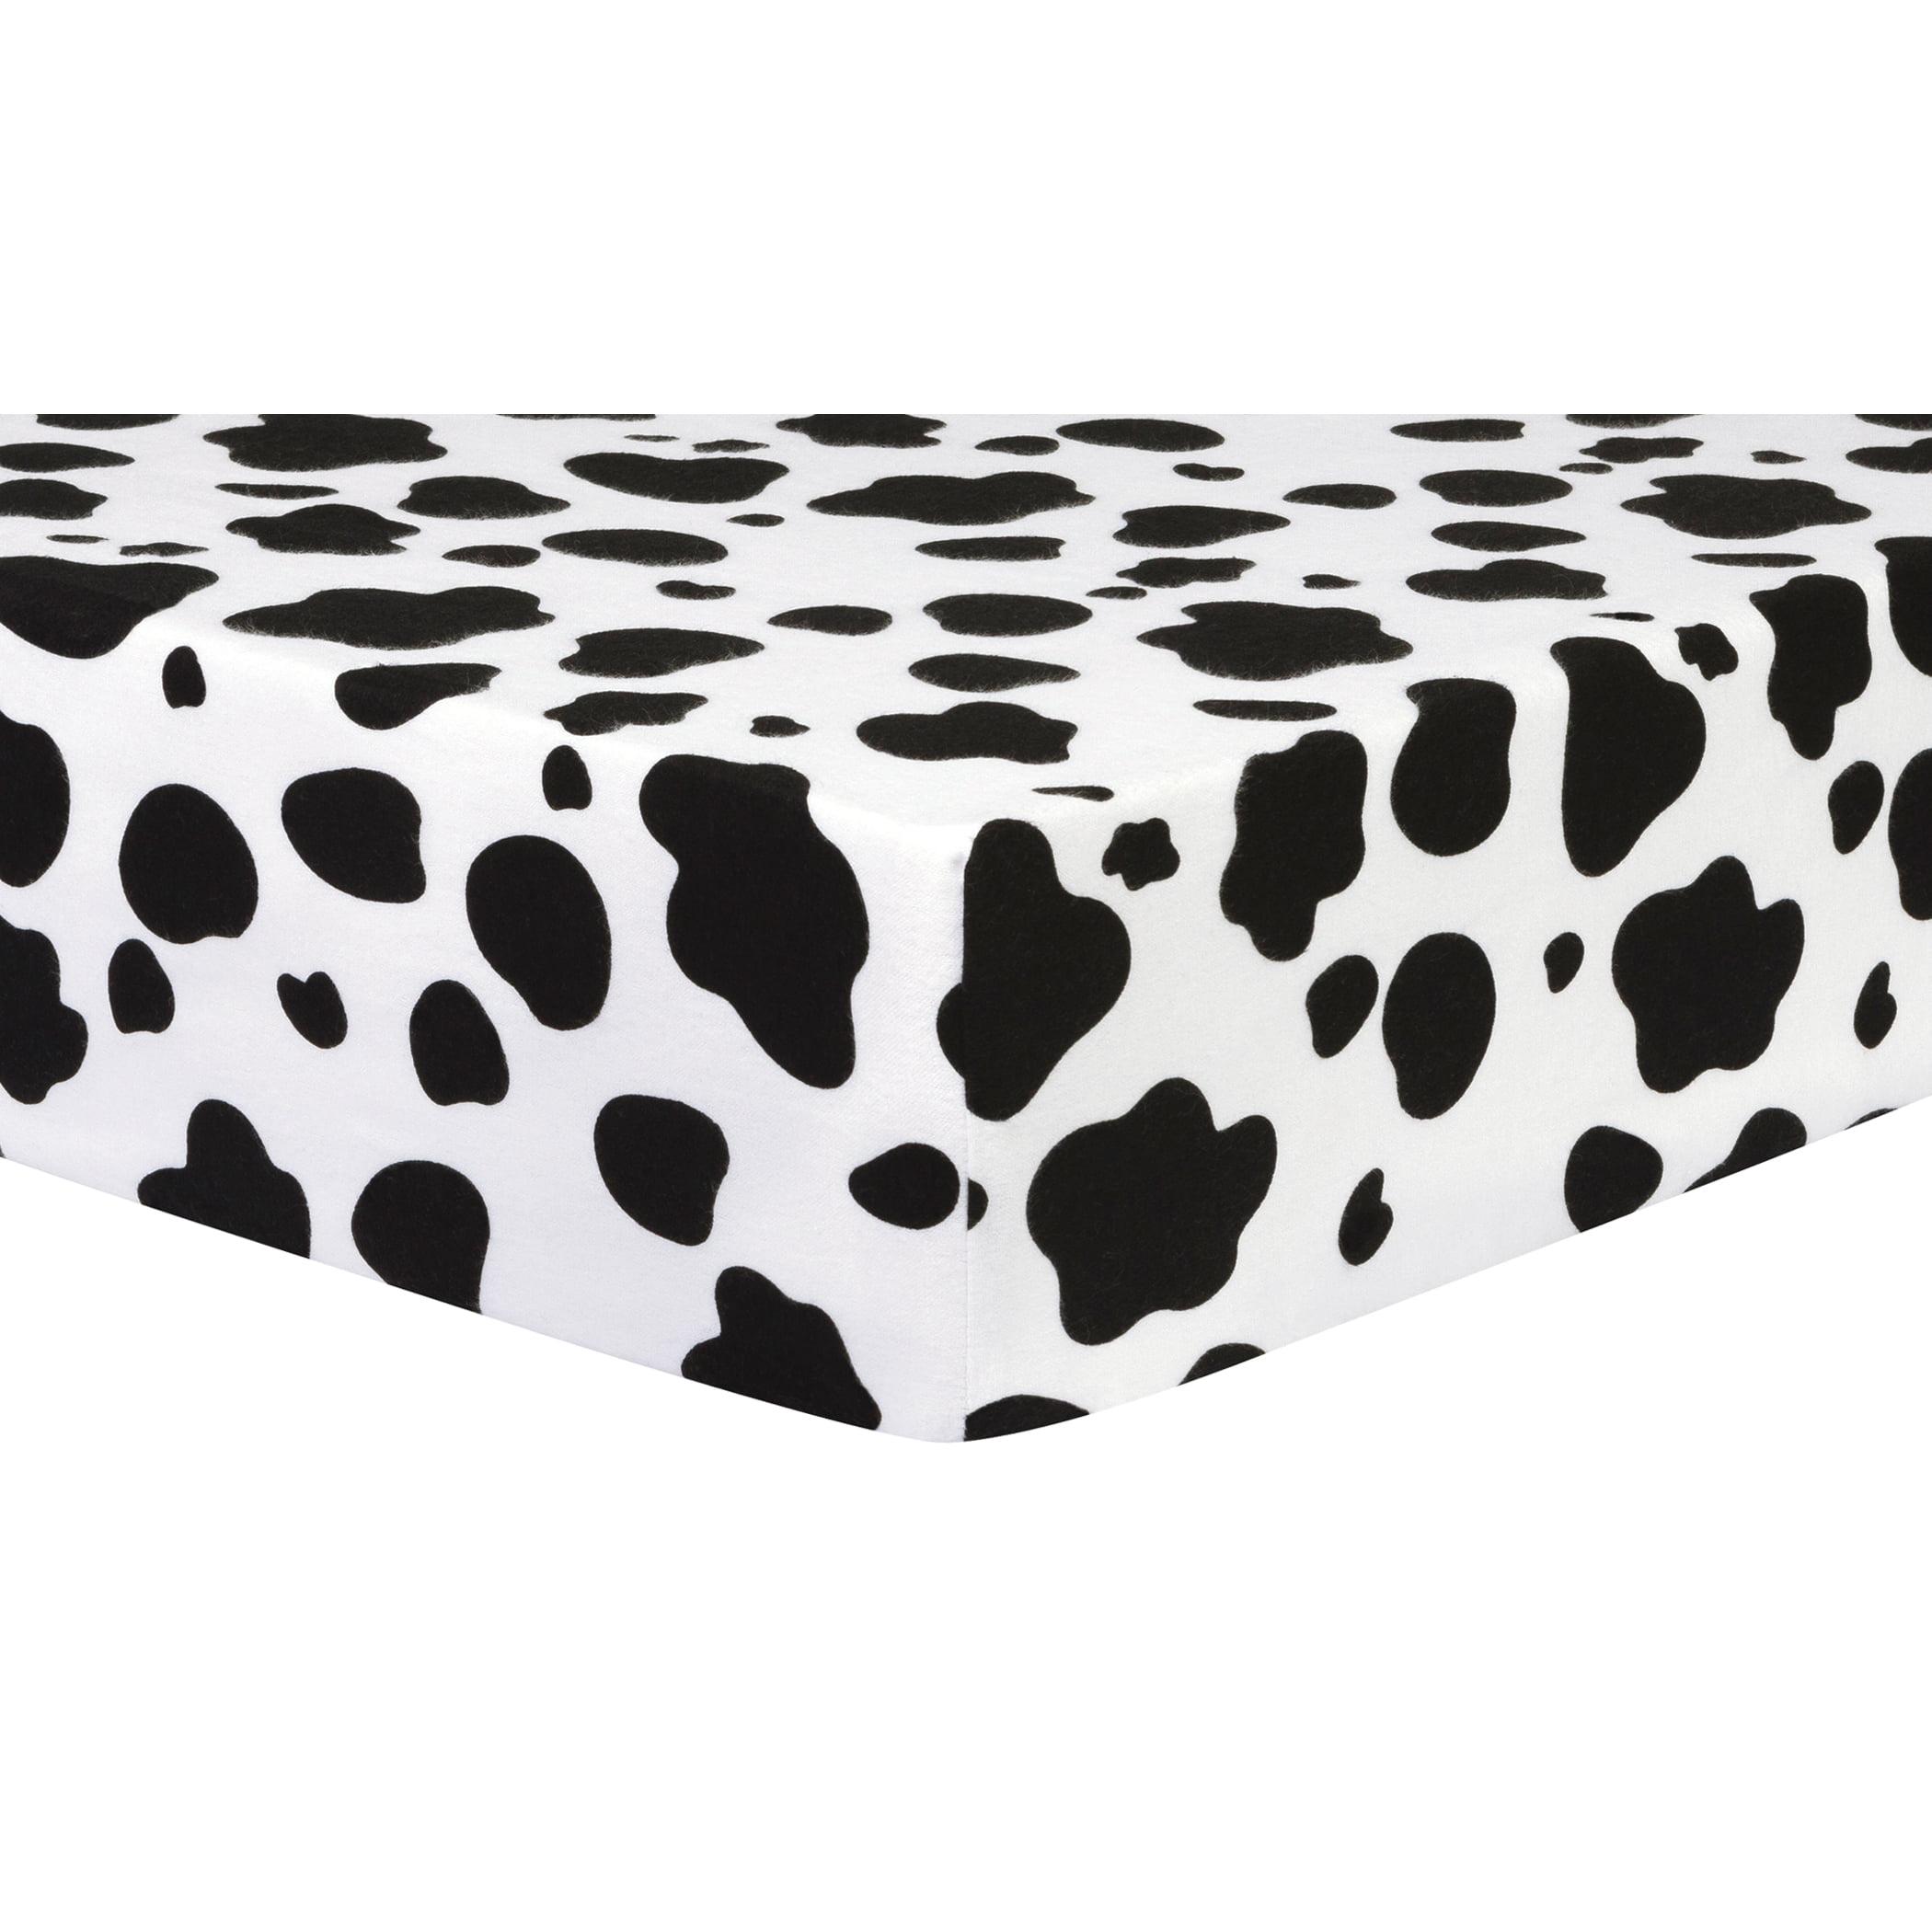 Black-and-White-Cow-Print-Crib-Sheet